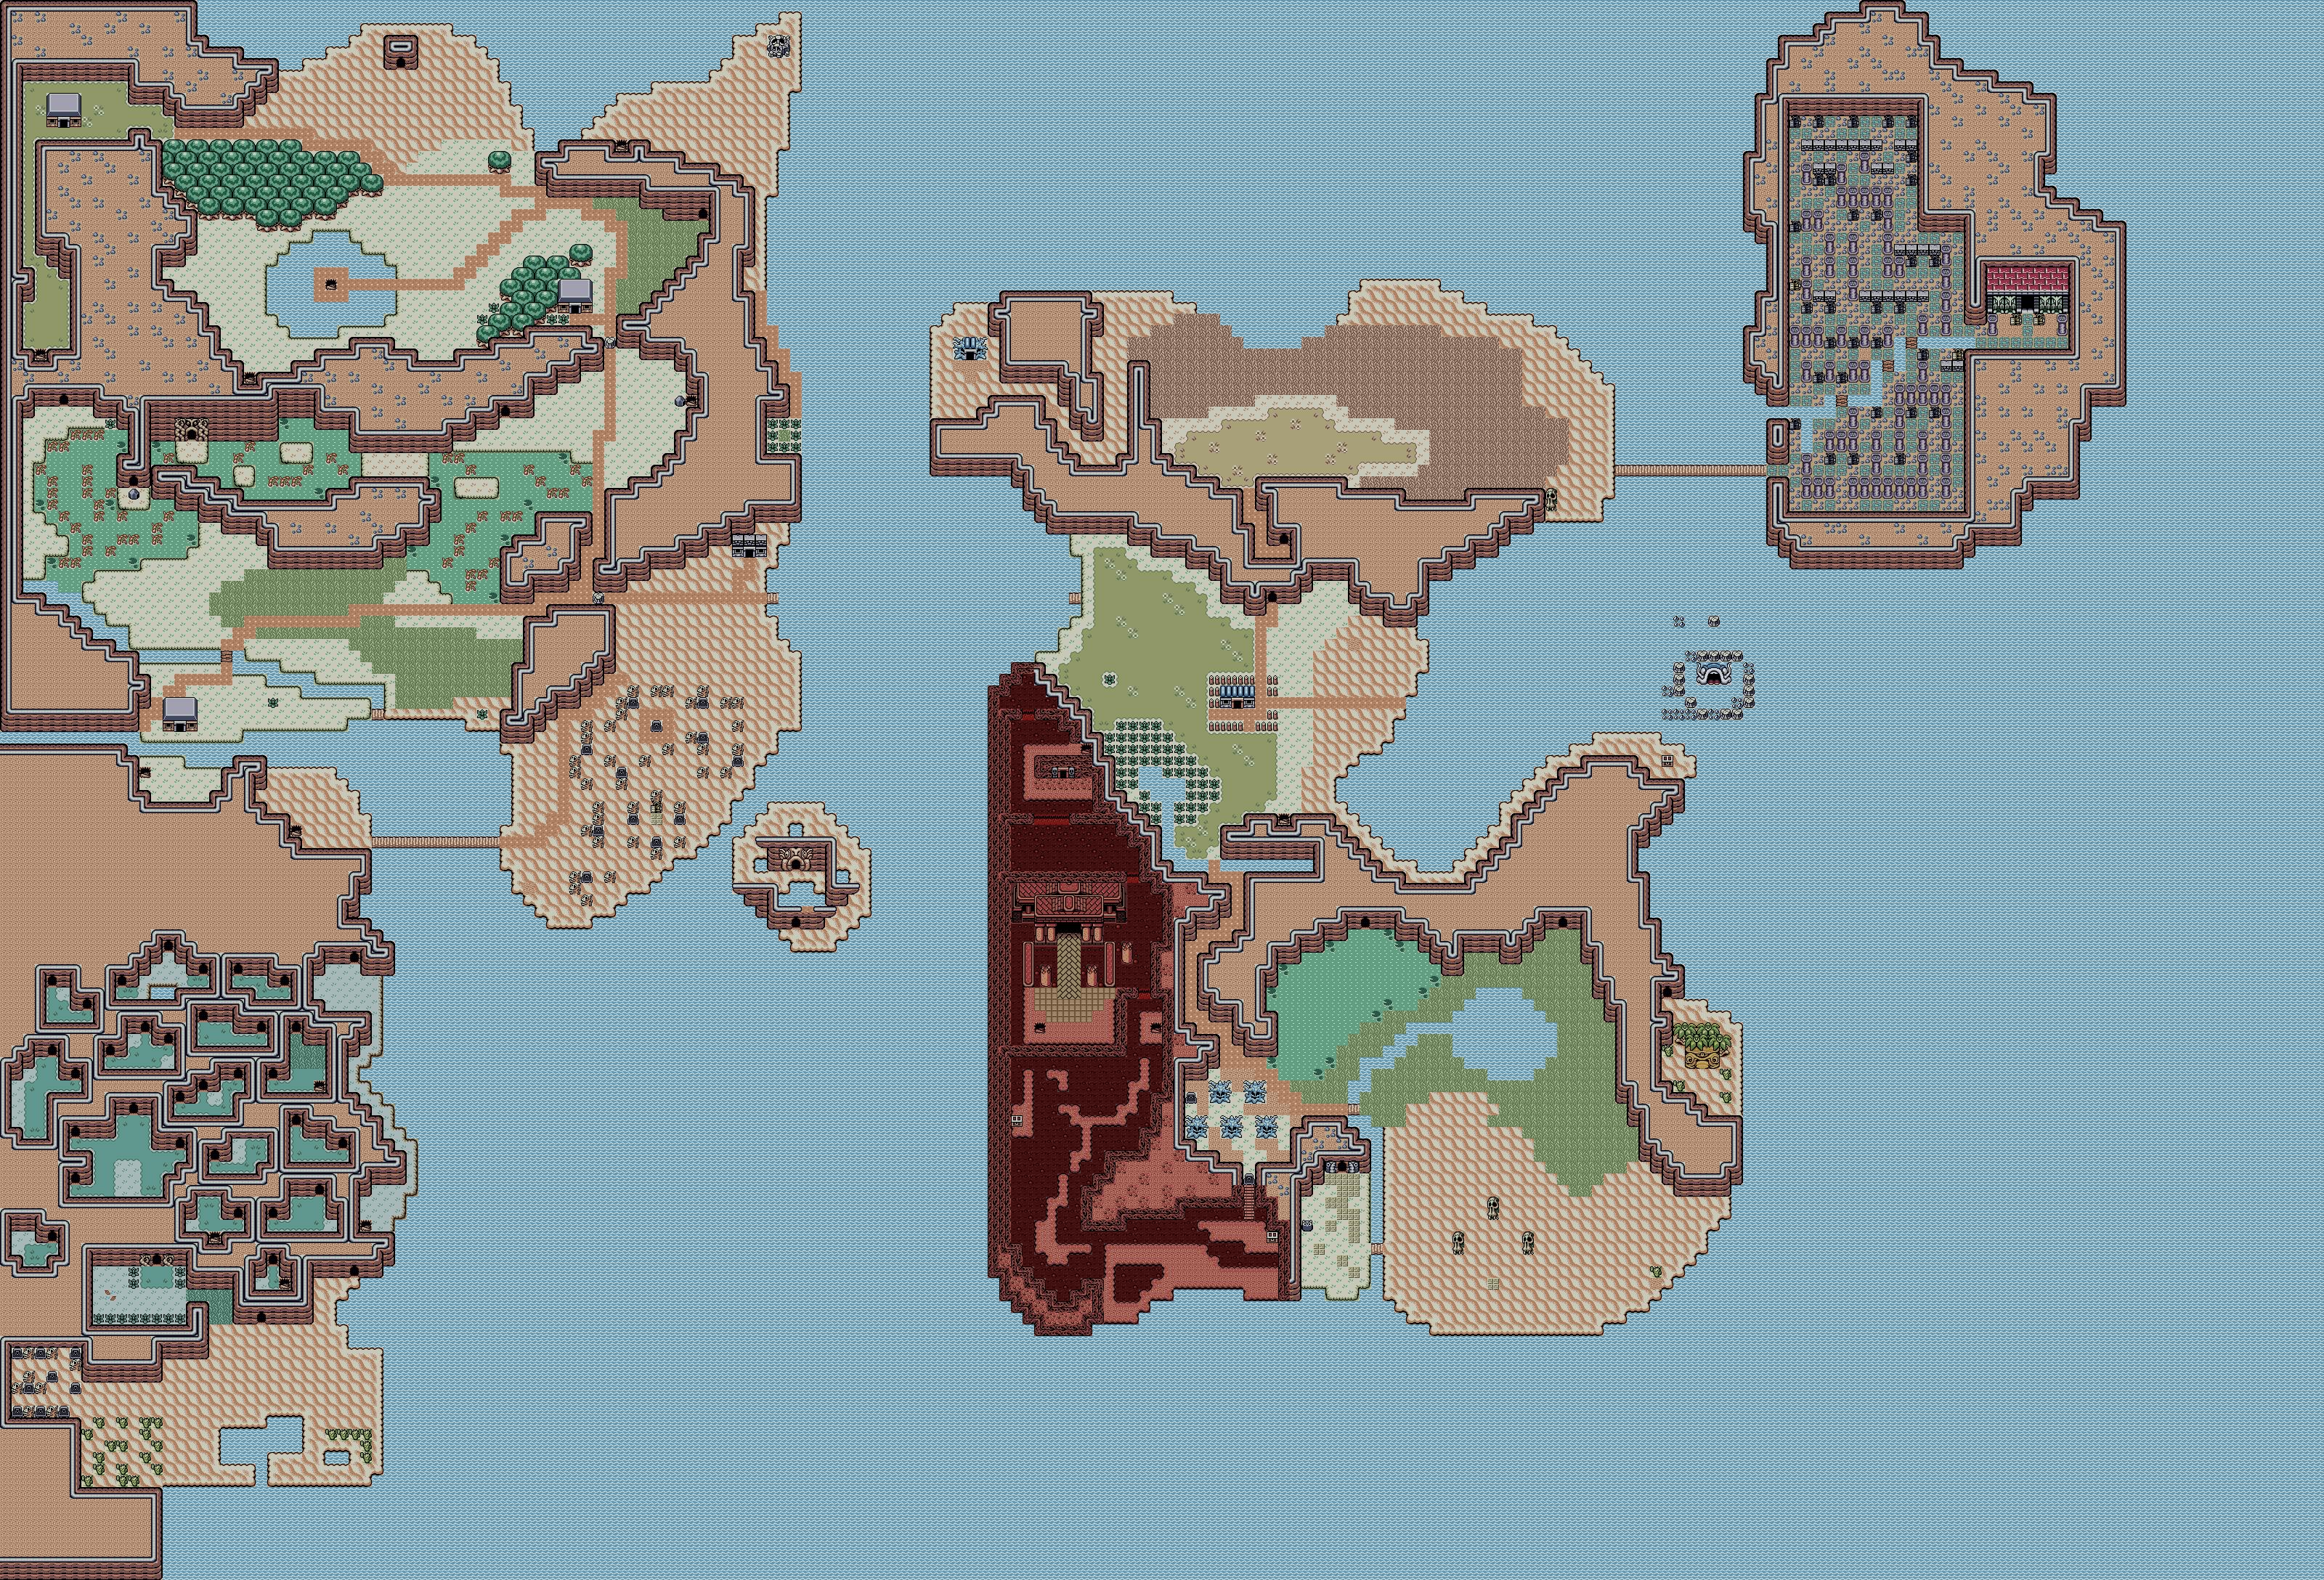 Zelda II World Map -( Link awakening Tiles ) by Hyrule452 on